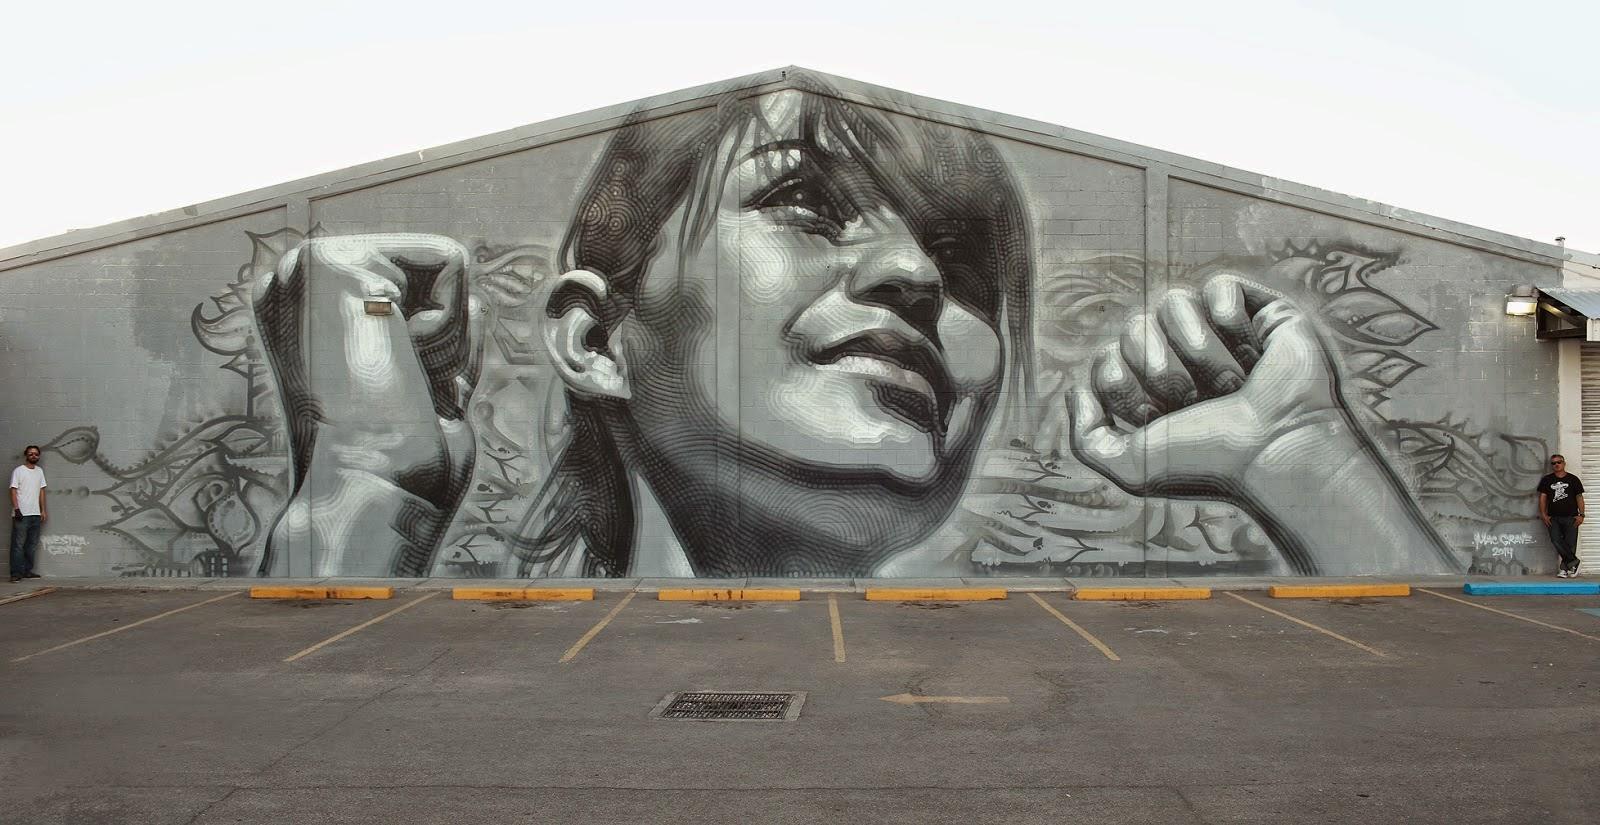 "El Mac paints ""Juarense y Poderosa"", a new mural in Ciudad Juarez, Mexico | StreetArtNews"